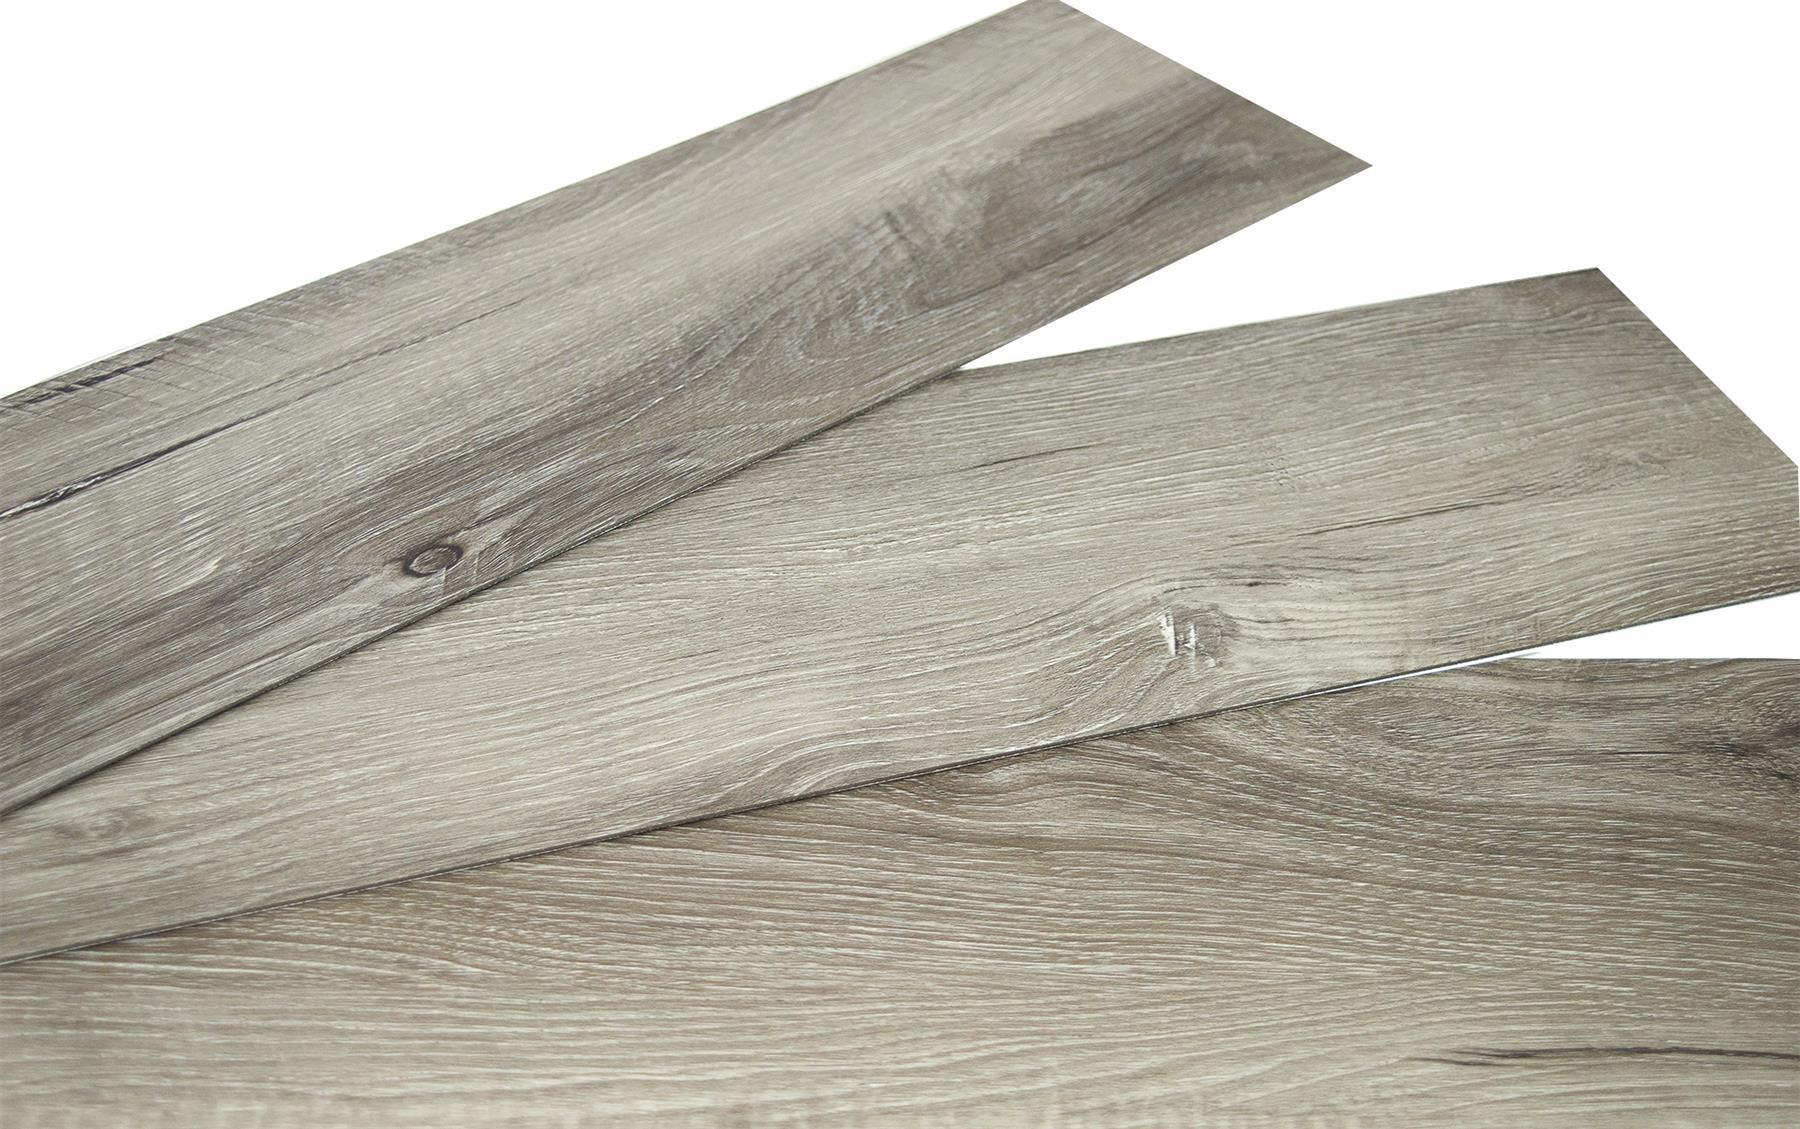 thumbnail 25 - Floor Planks Tiles Self Adhesive Dark Grey Wood Vinyl Flooring Kitchen Bathroom